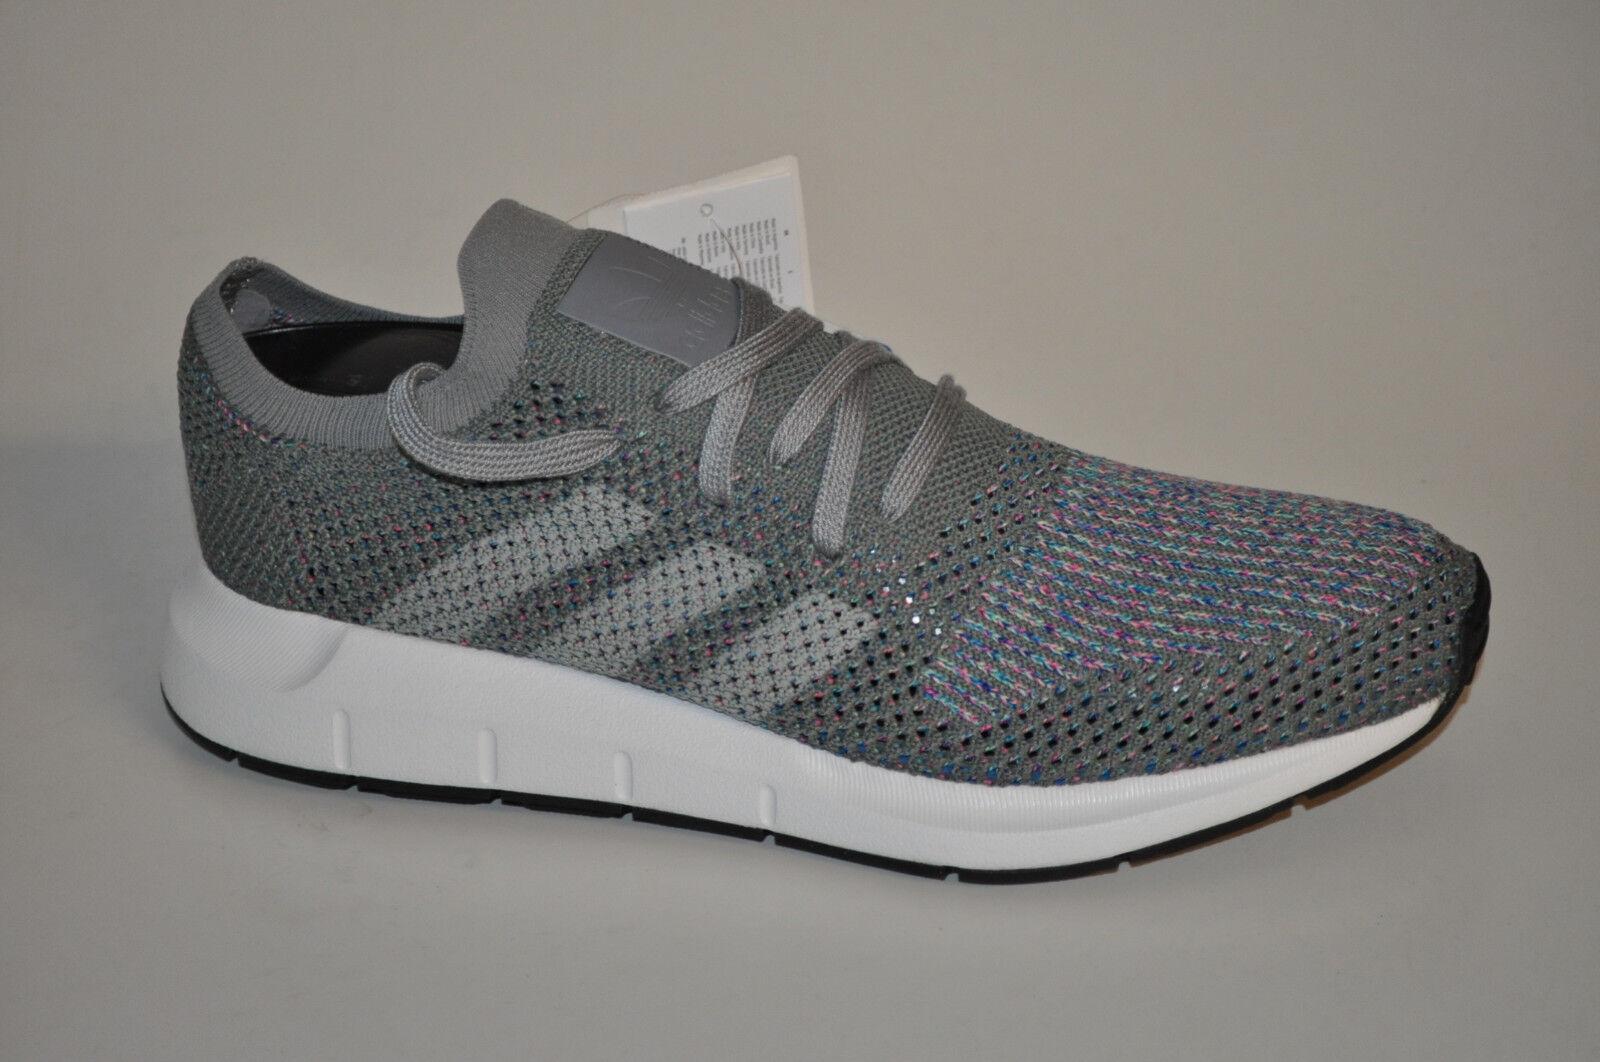 Adidas Swift Run Run Run PK Primeknit CG4128 grau Weiß Grau  Weiß 141c94